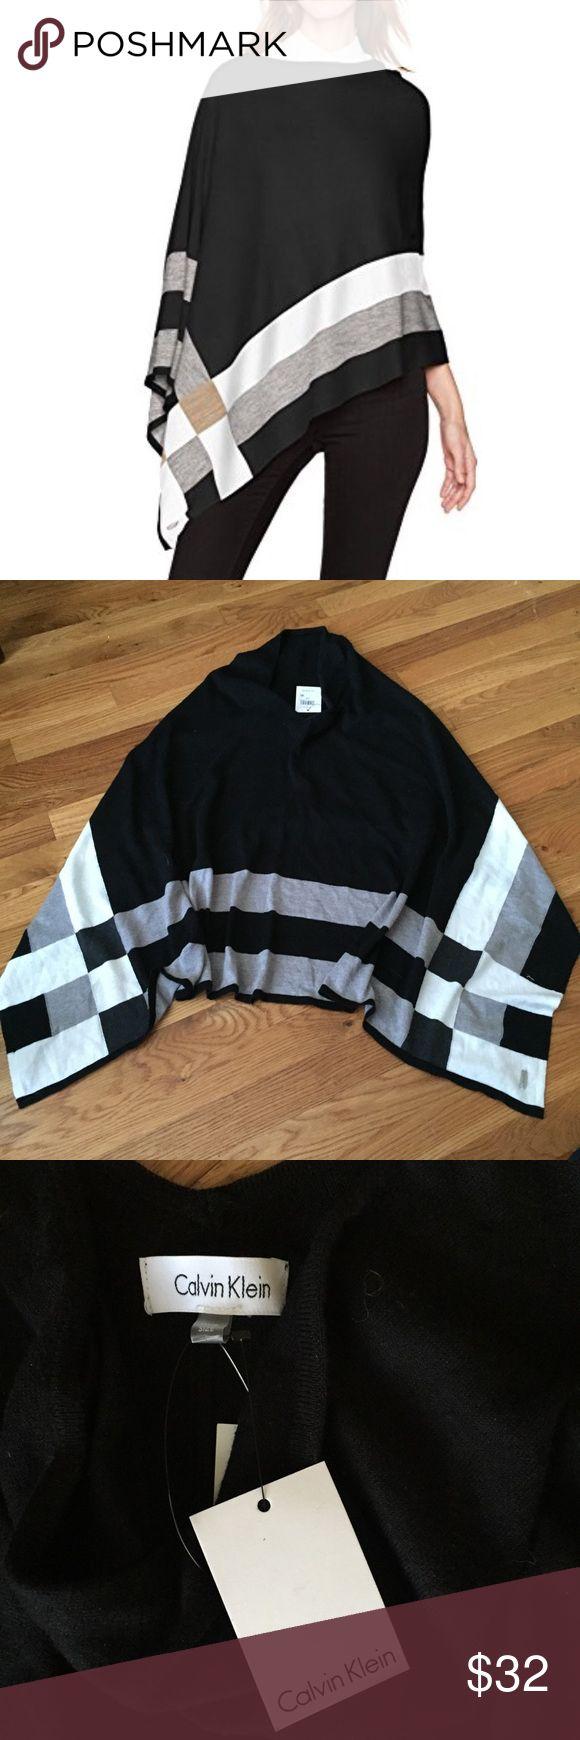 NWT Calvin Klein Plaid Asymmetrical Poncho NEW with Tags Calvin Klein Plaid Asymmetrical black/white/grey (no tan color) poncho. Classic & comfy! Perfect Condition!!! Calvin Klein Sweaters Shrugs & Ponchos